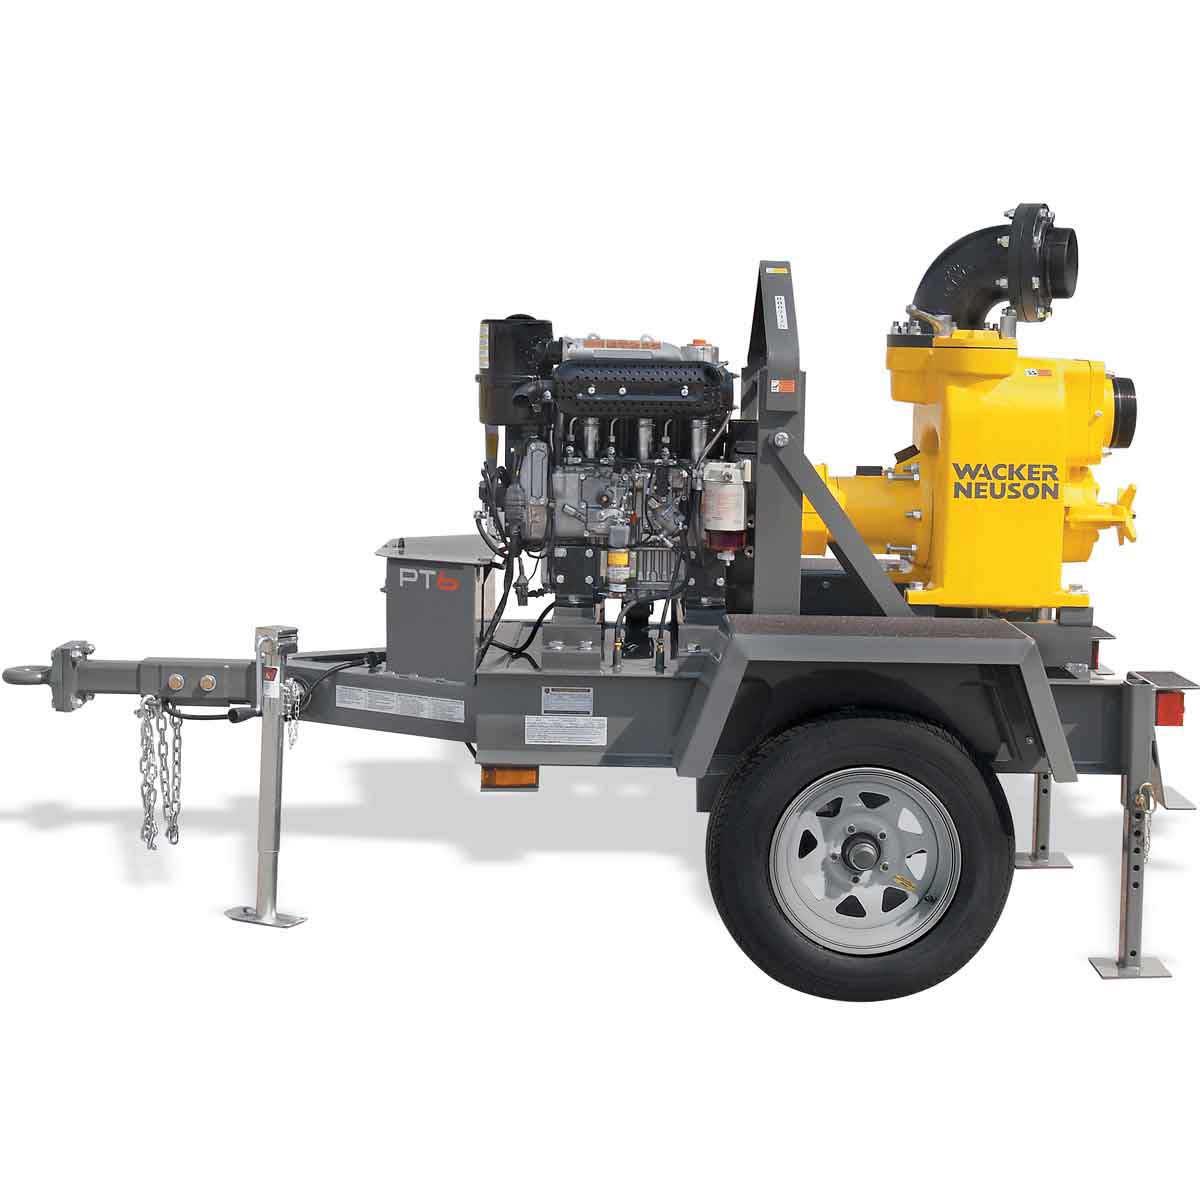 5200014741 Wacker Neuson PTS 6 inch Trash Pump